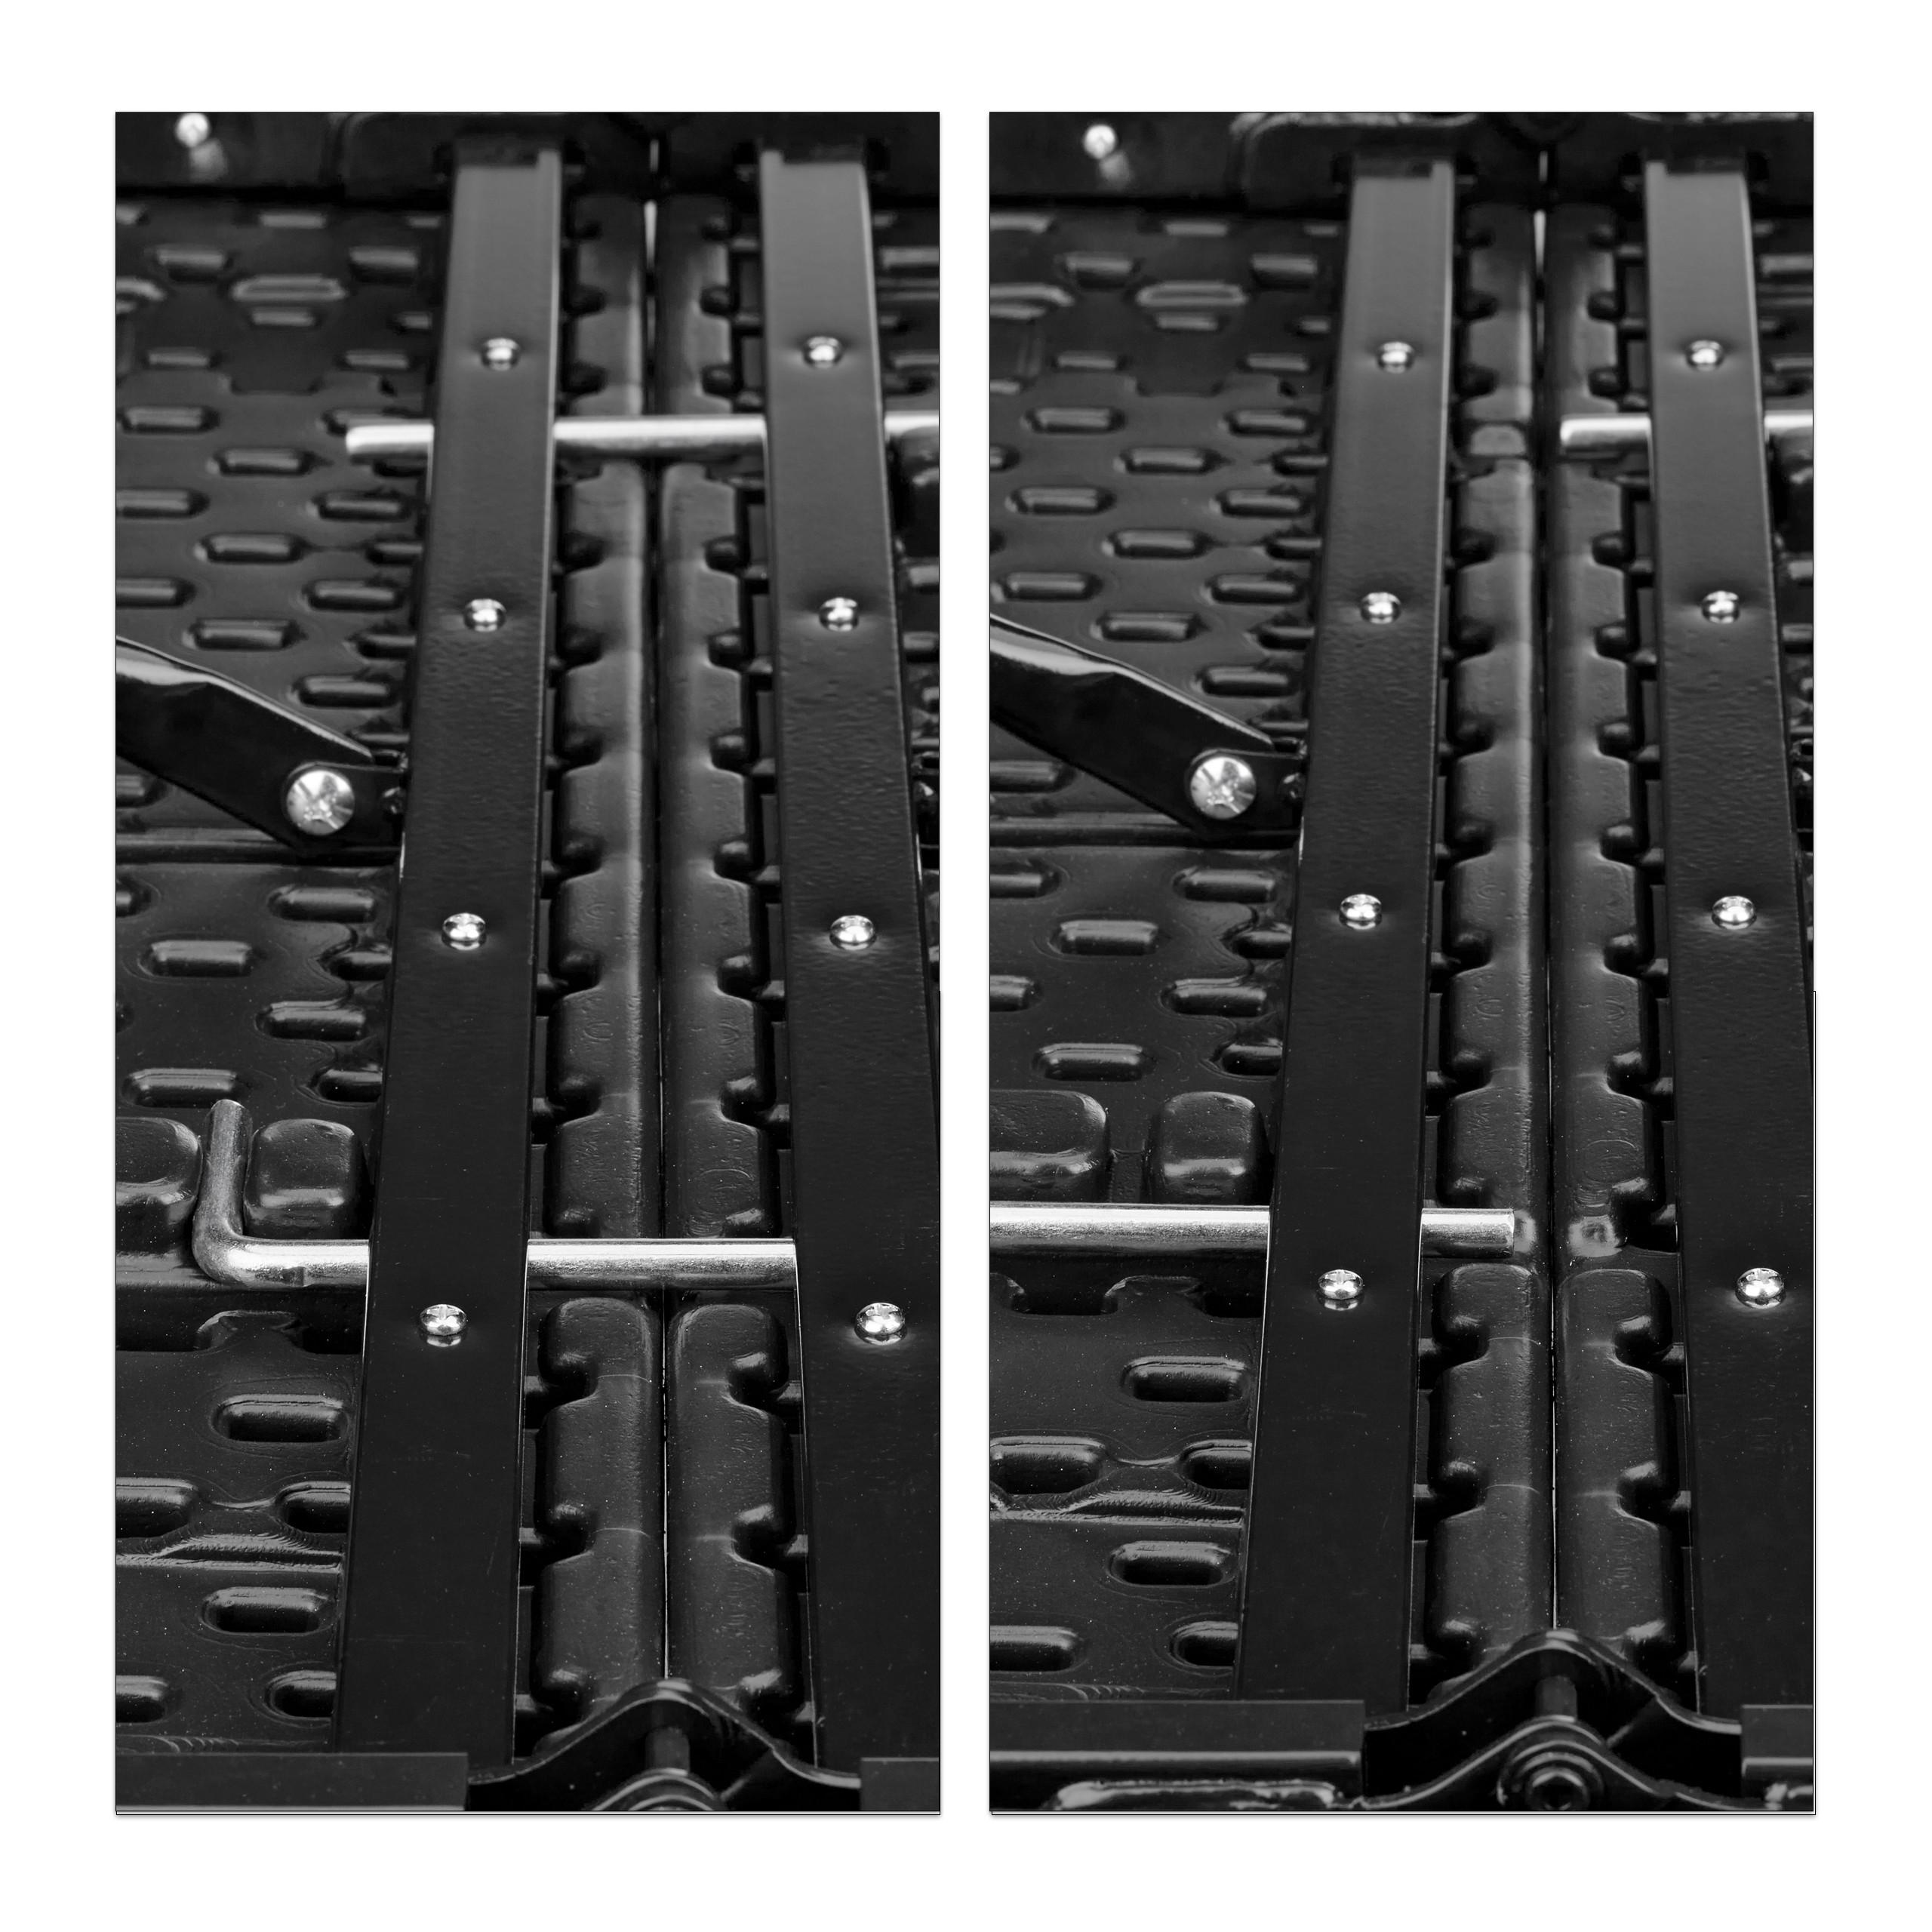 Bierzeltgarnitur klappbar BASTIAN in Rattan-Optik Gartenmöbel Set Biertisch